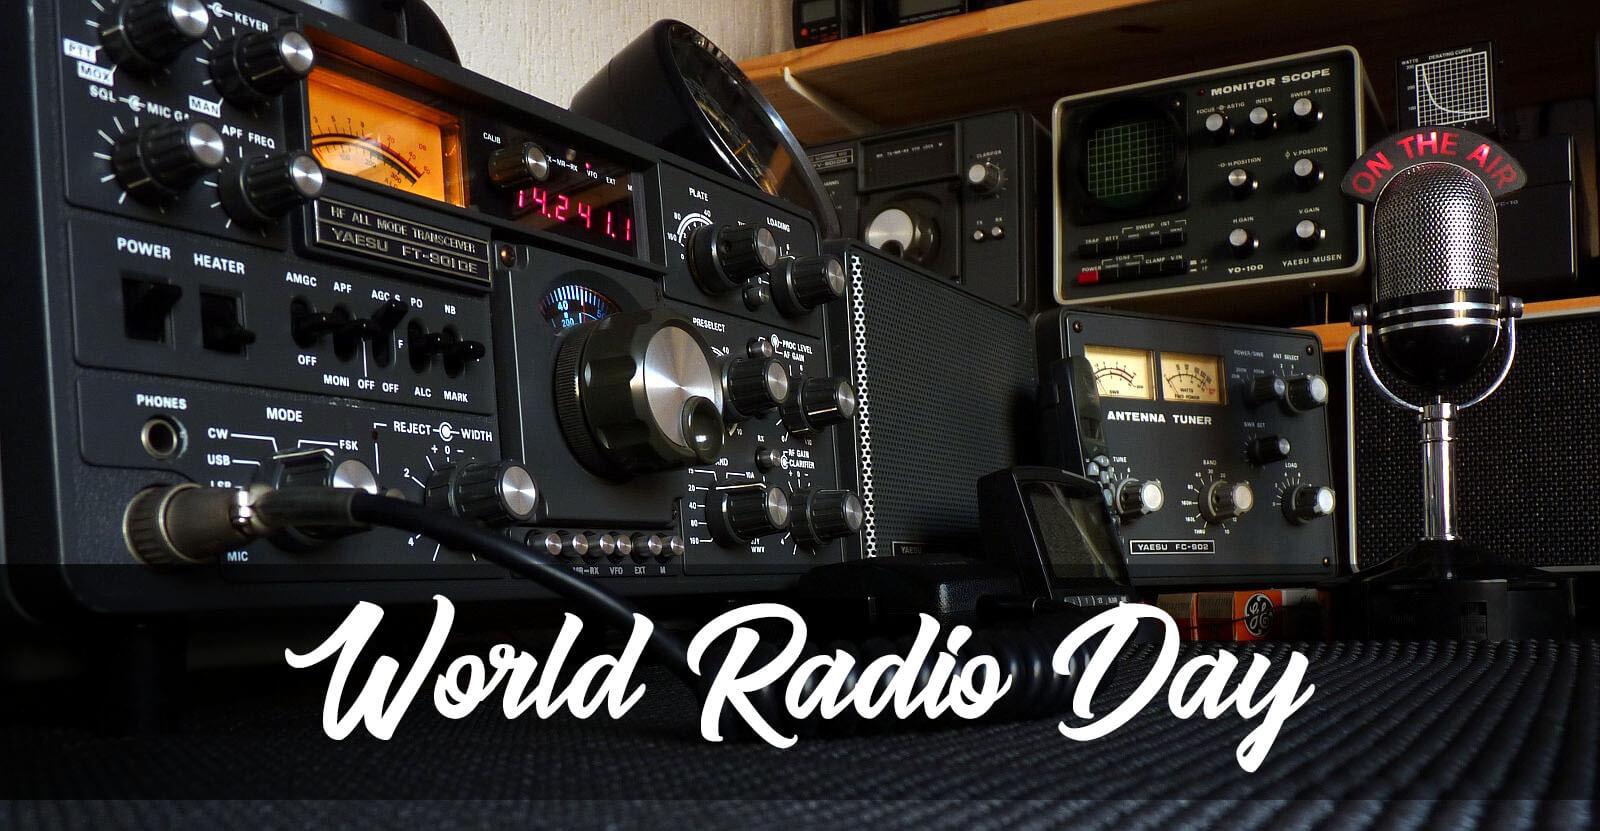 world radio day new latest pc desktop background wide hd wallpaper